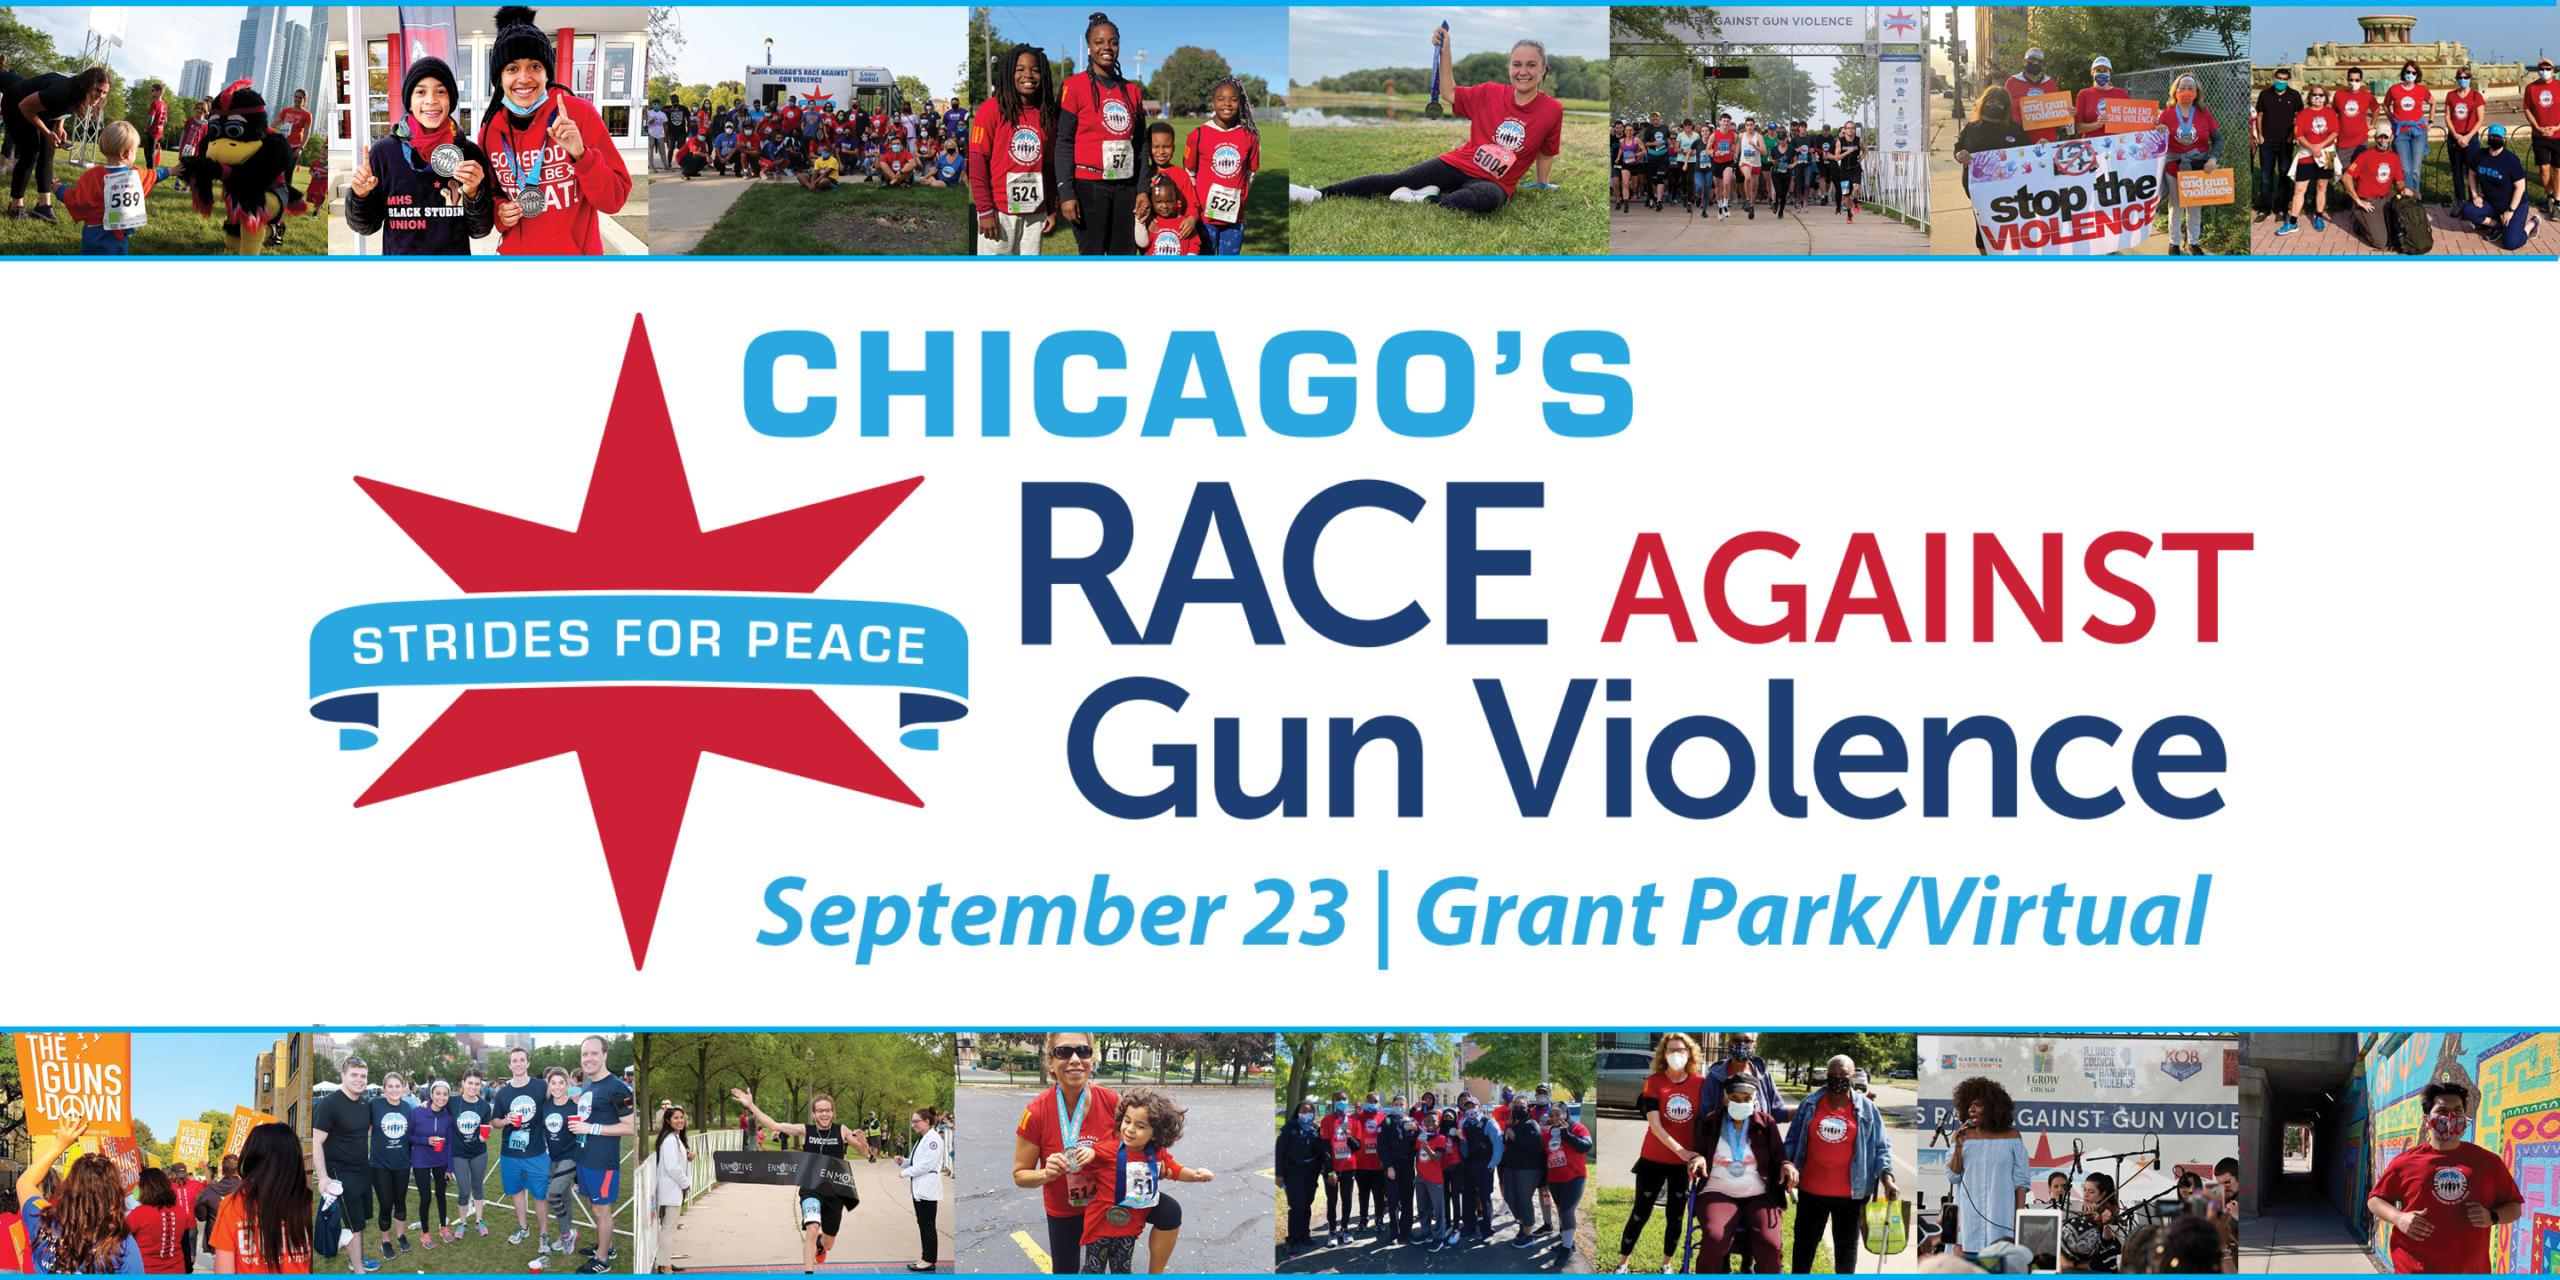 Strides For Peace, Race Against Gun Violence